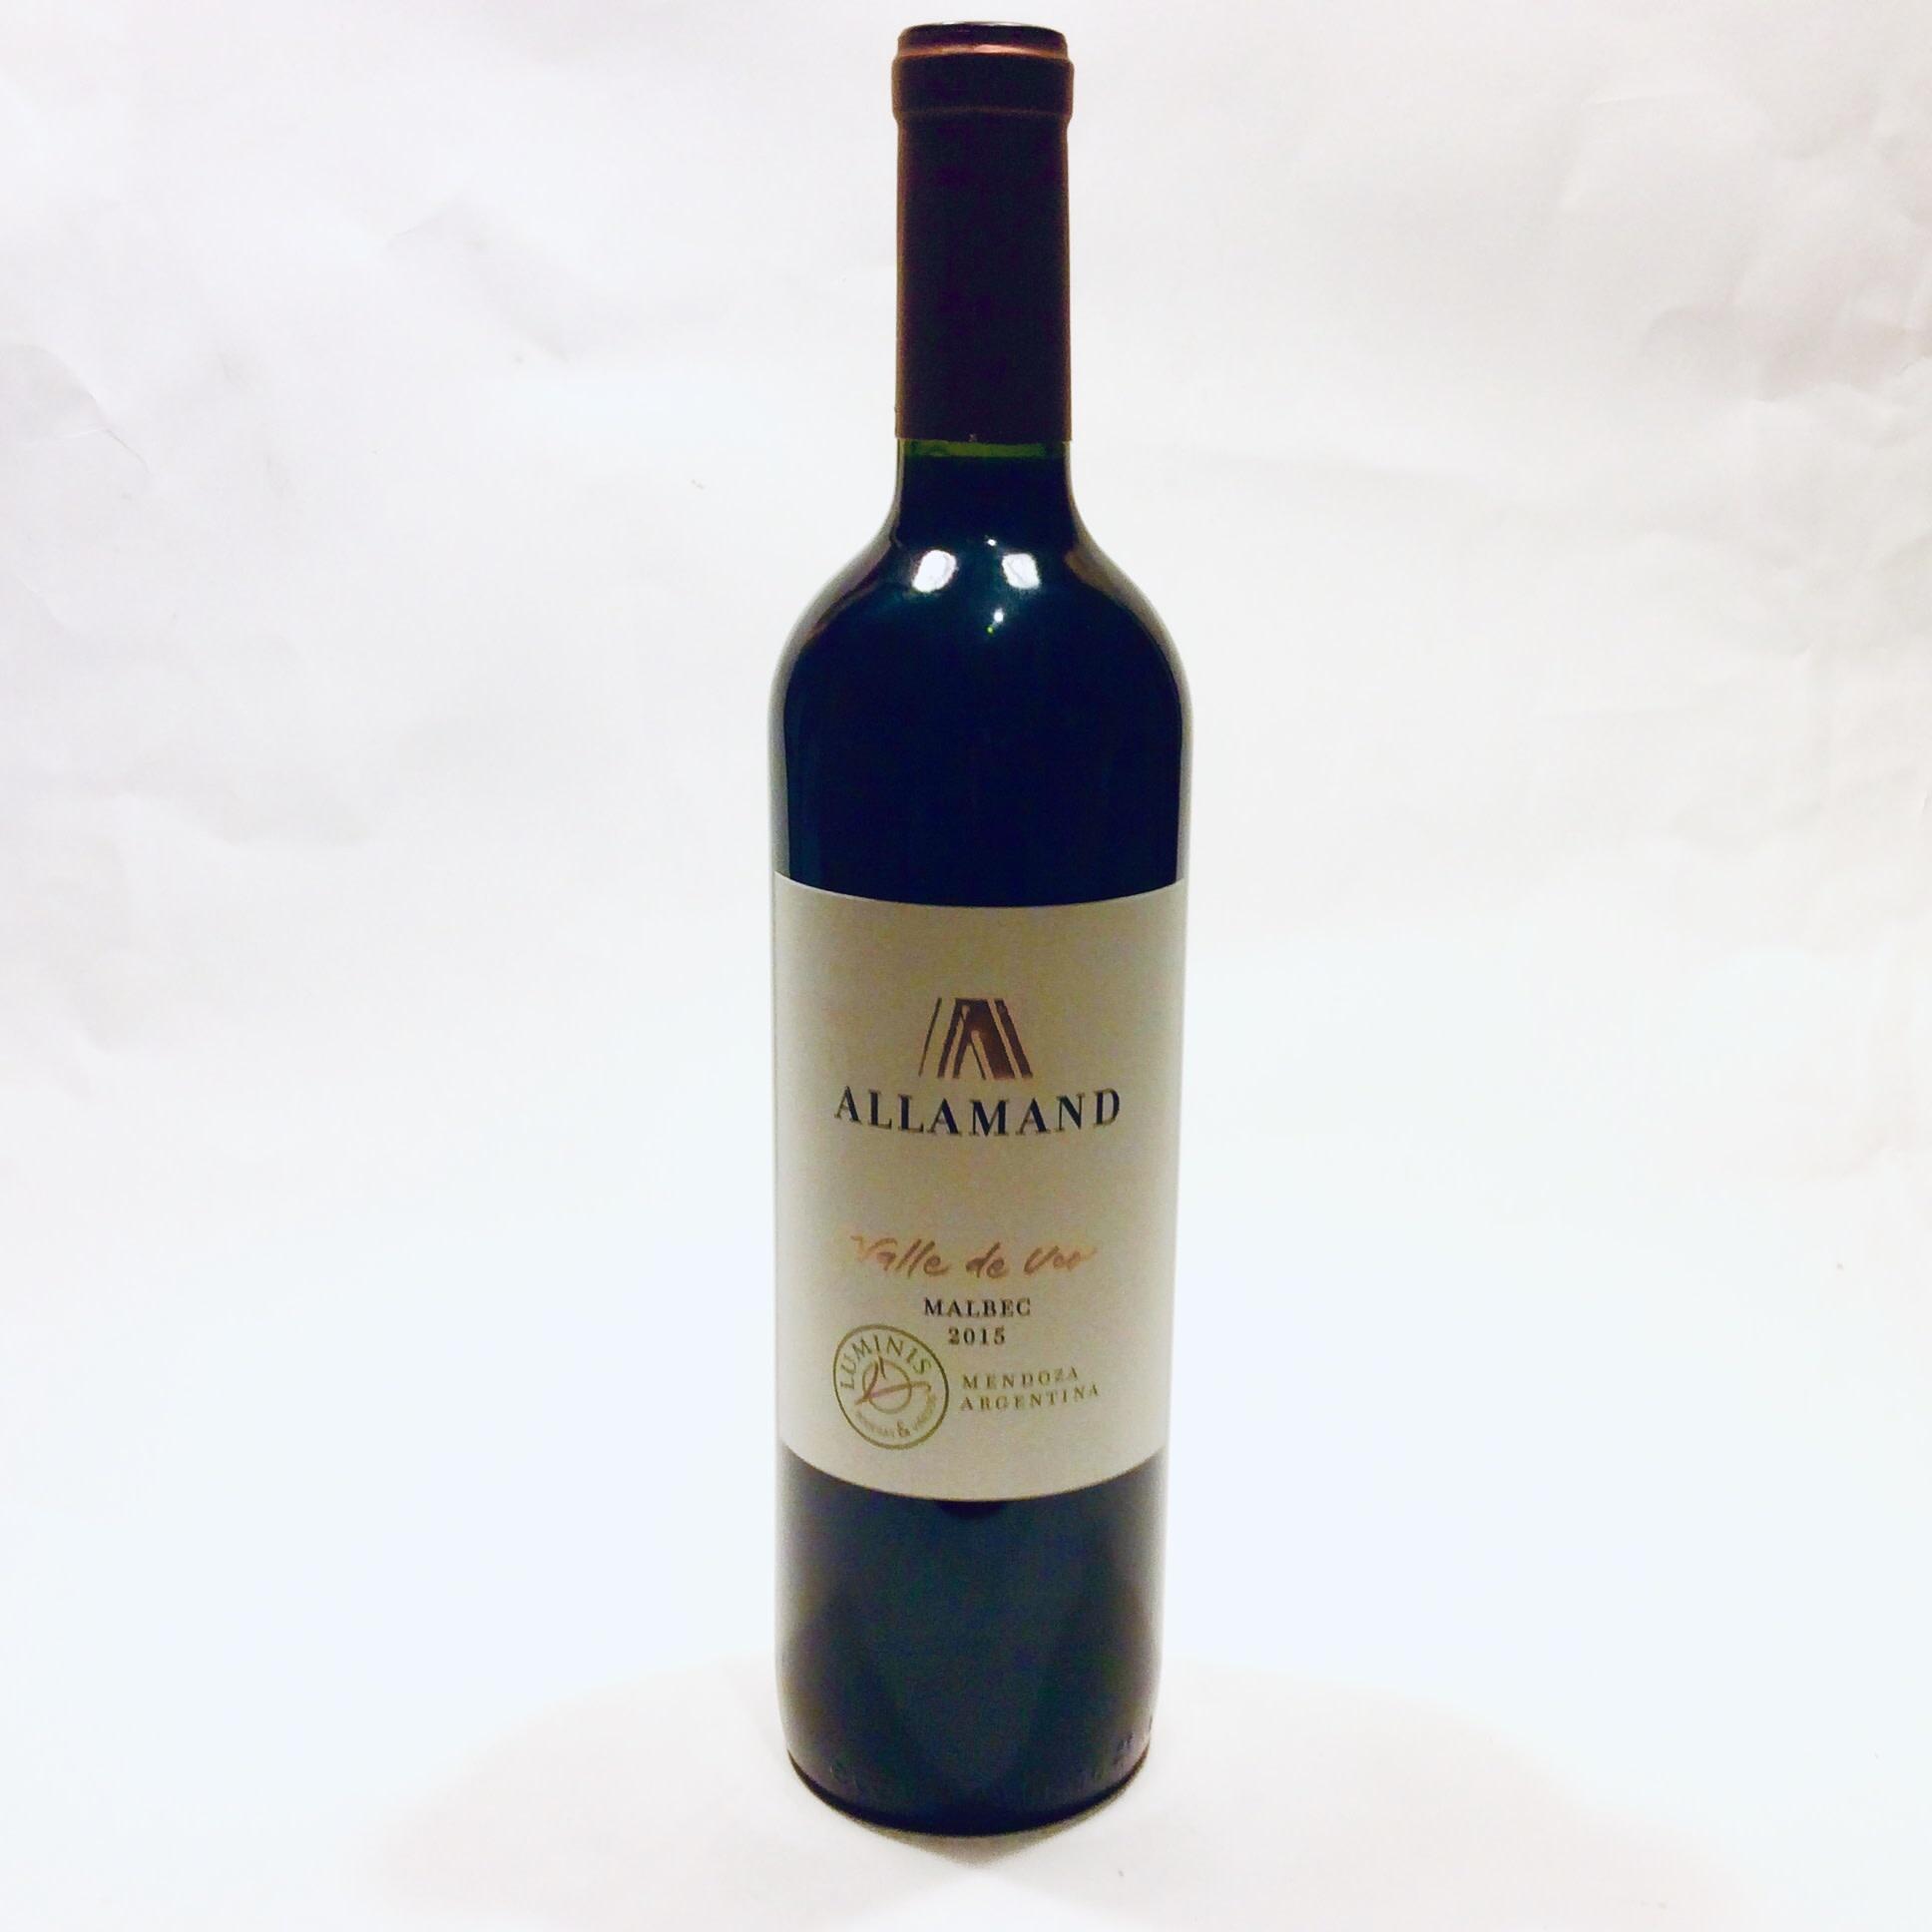 Allamand Valle de Uco Mendoza - Malbec 2015 (750 ml)